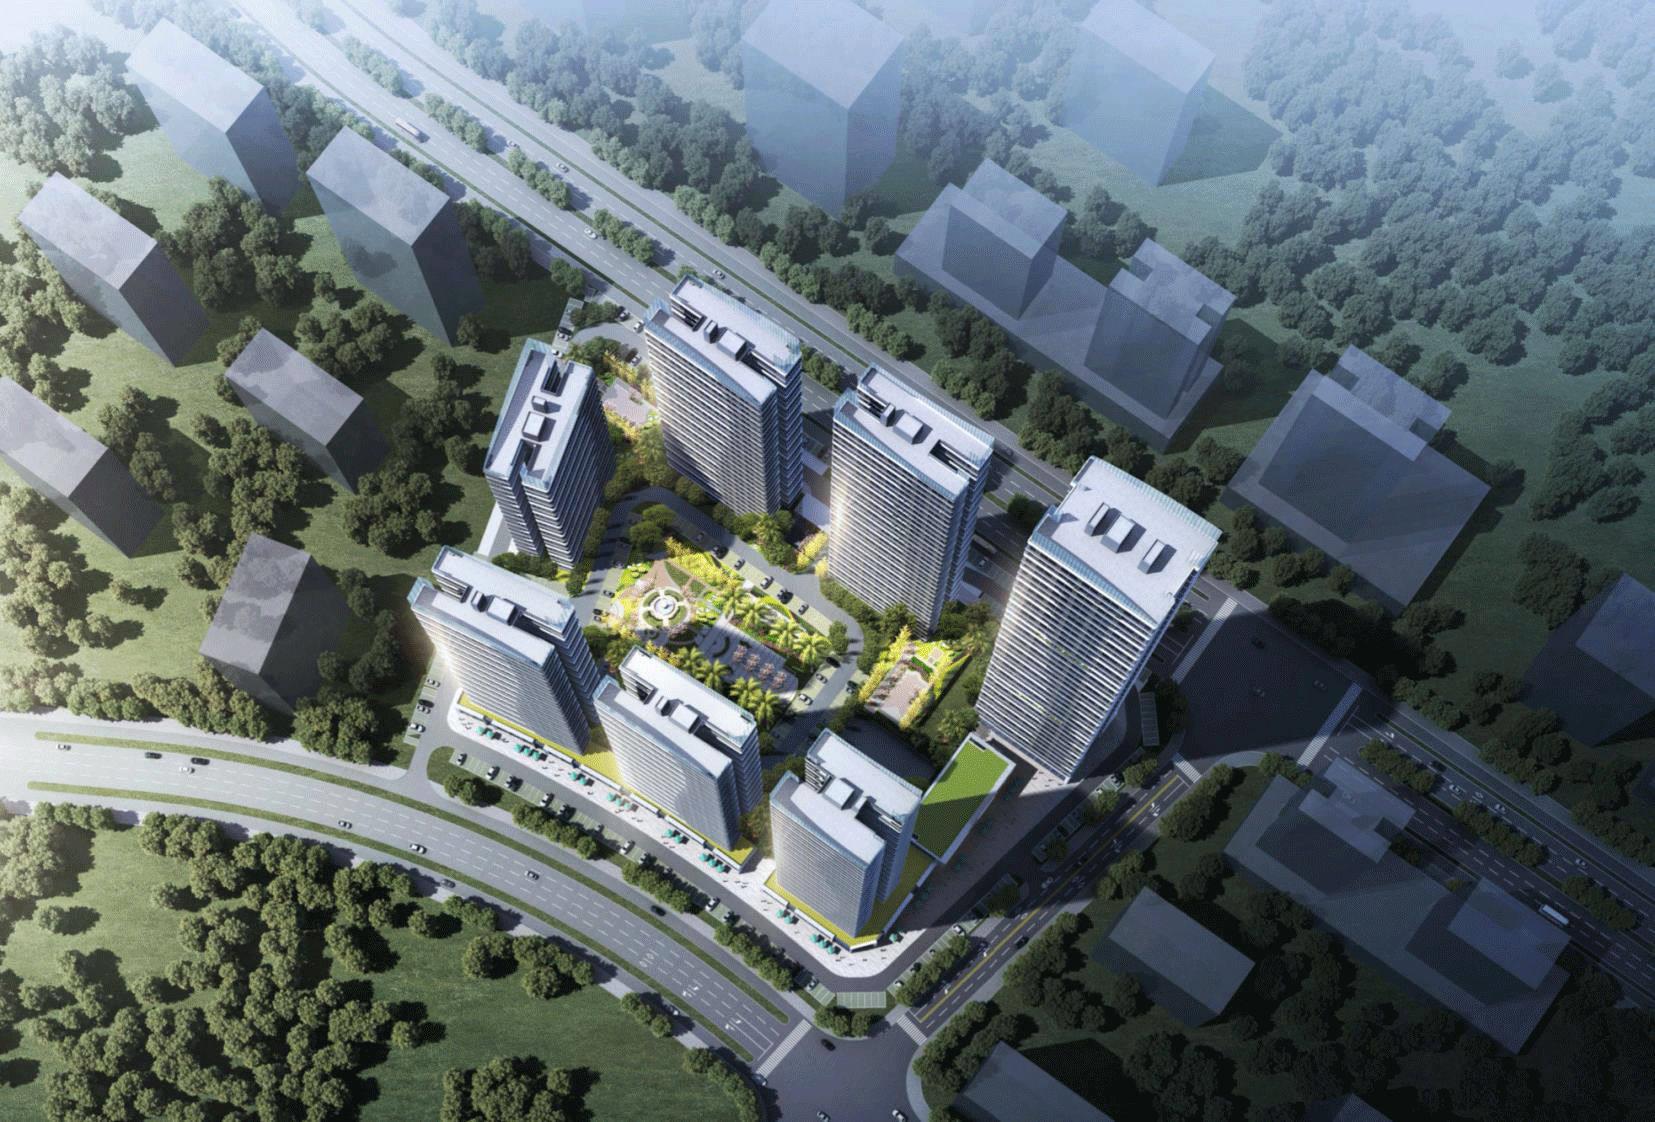 http://yuefangwangimg.oss-cn-hangzhou.aliyuncs.com/uploads/20210222/5bd38e9fb85156c928e52a67e2eb5b86Max.jpg